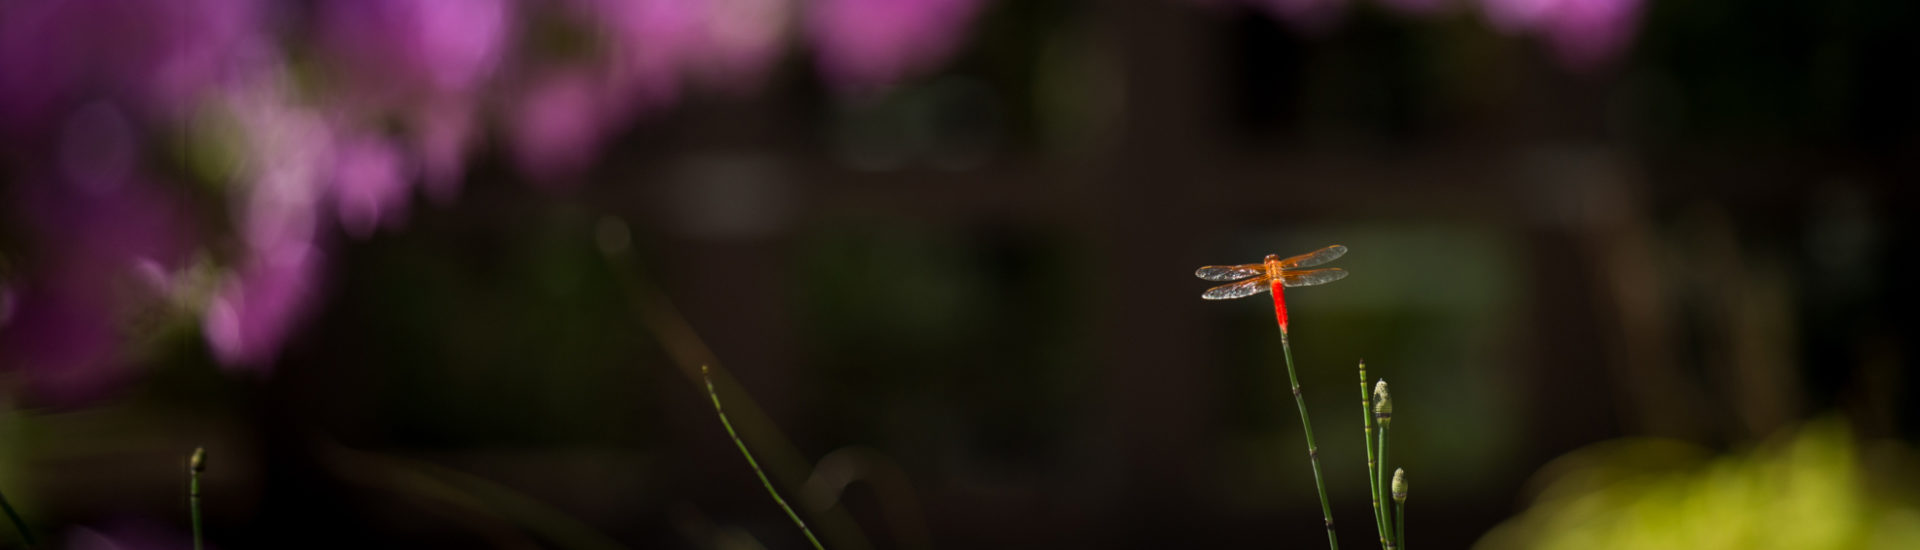 032_CCH_Garden_BrendaLaddPhoto